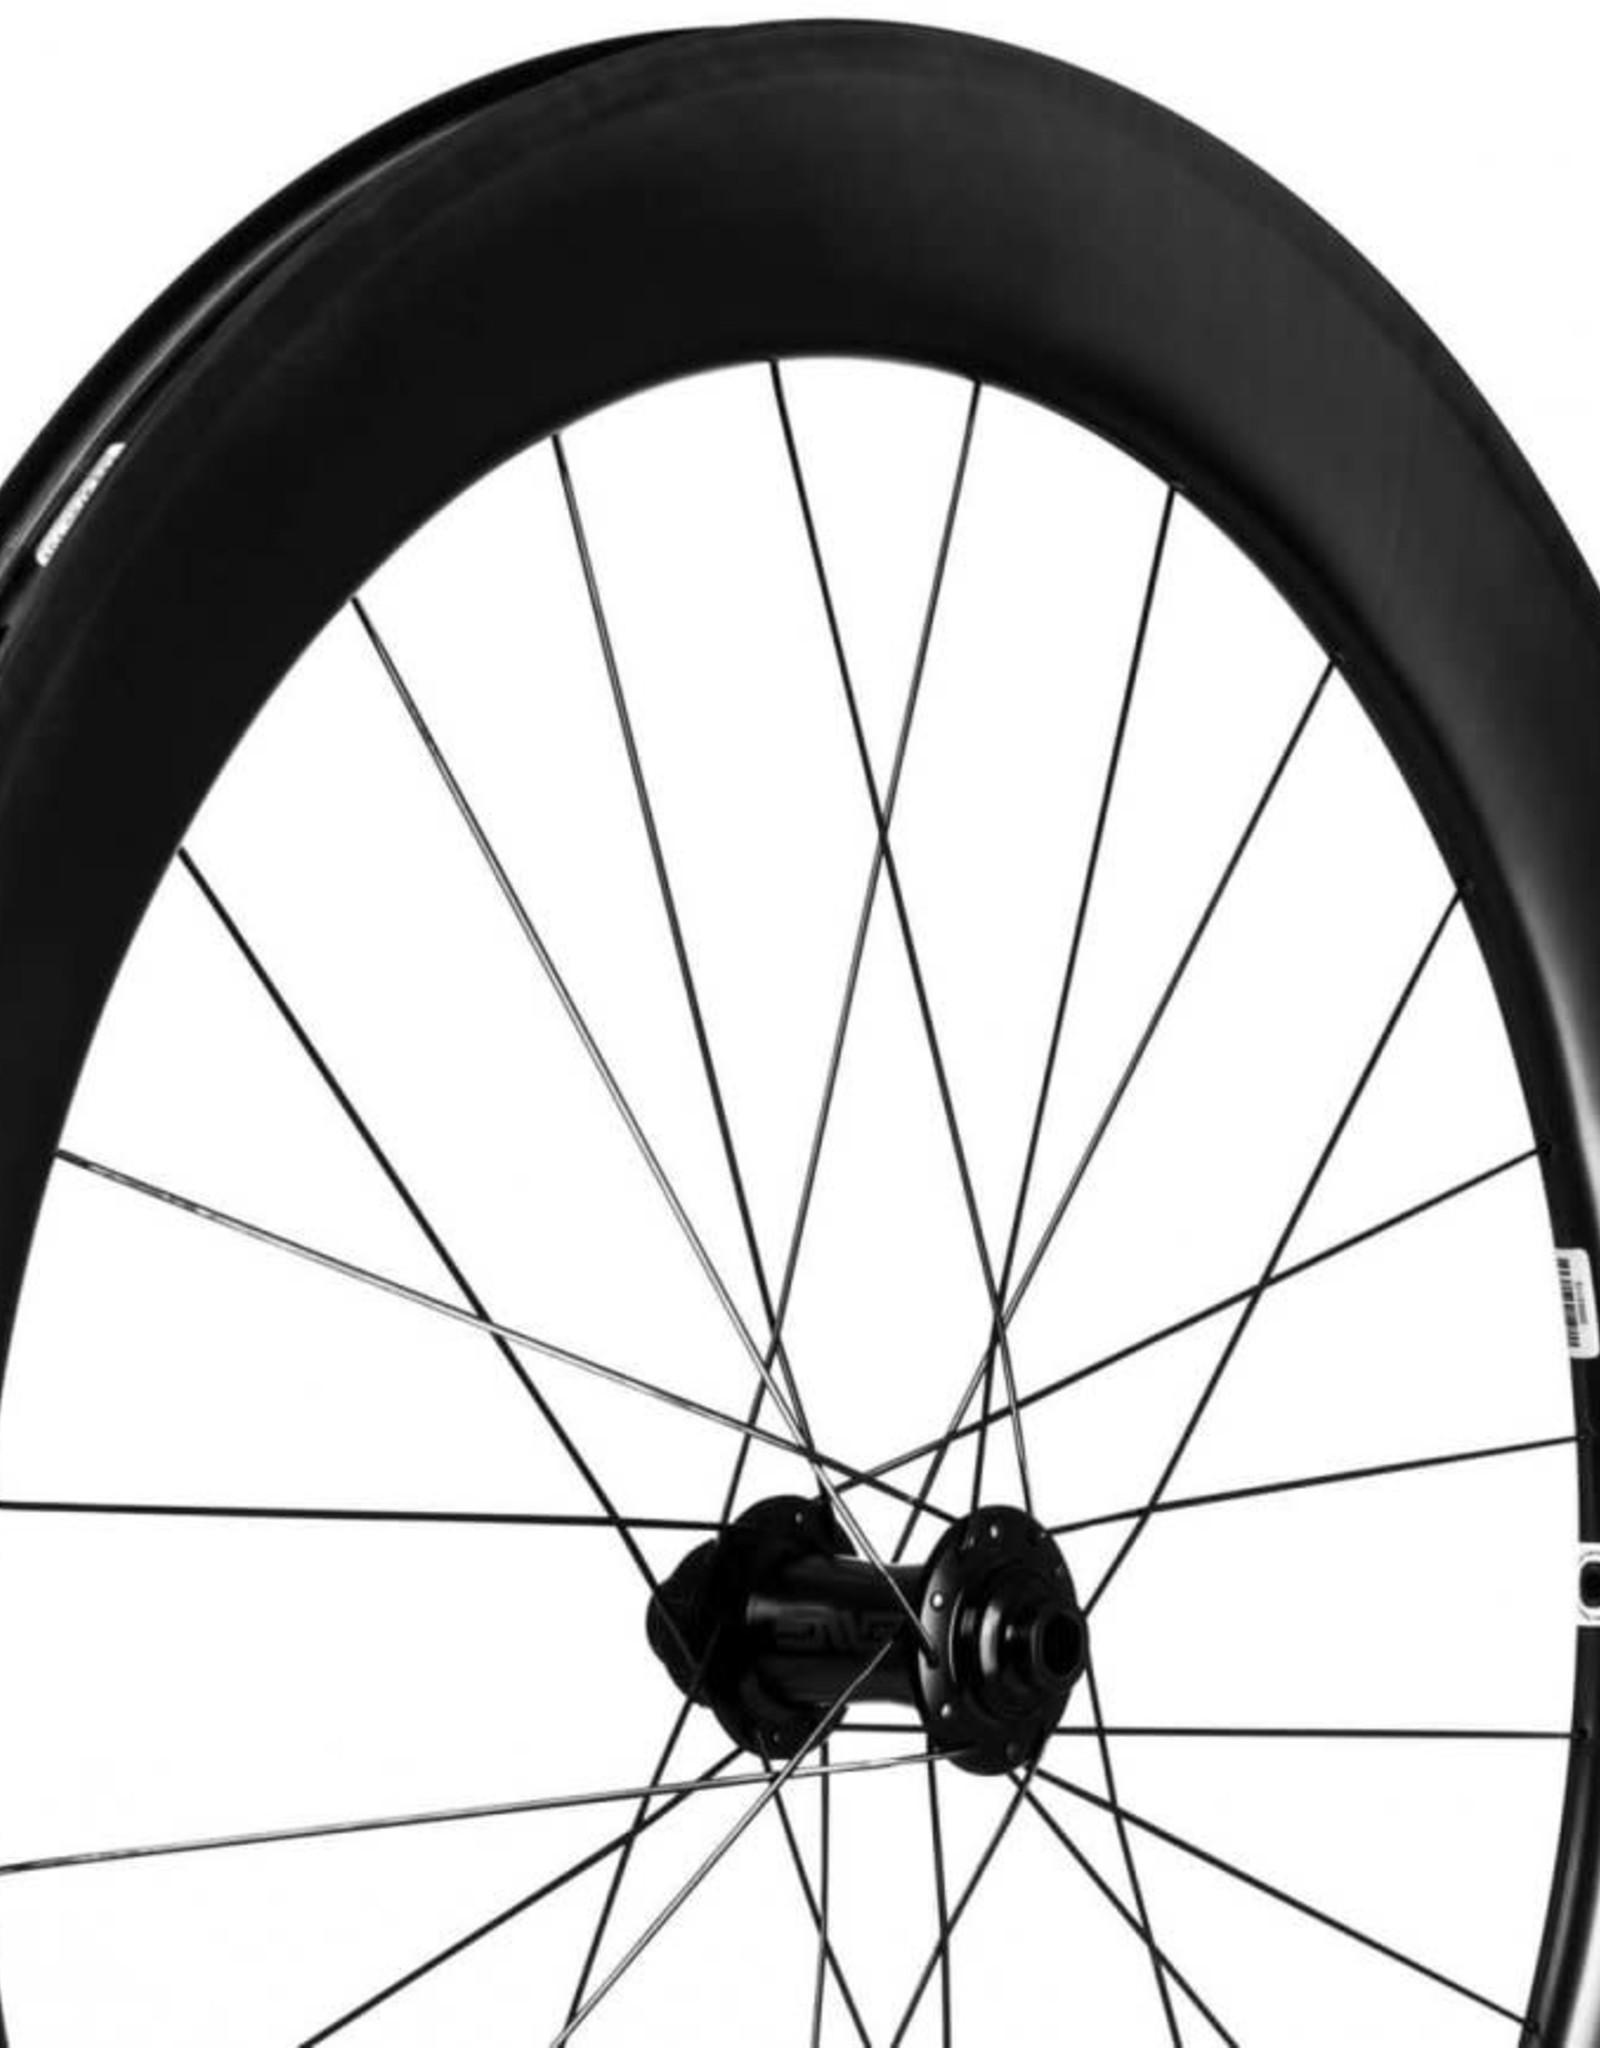 Enve - Foundation Wheelset - 65mm, 12/142, S11, CL